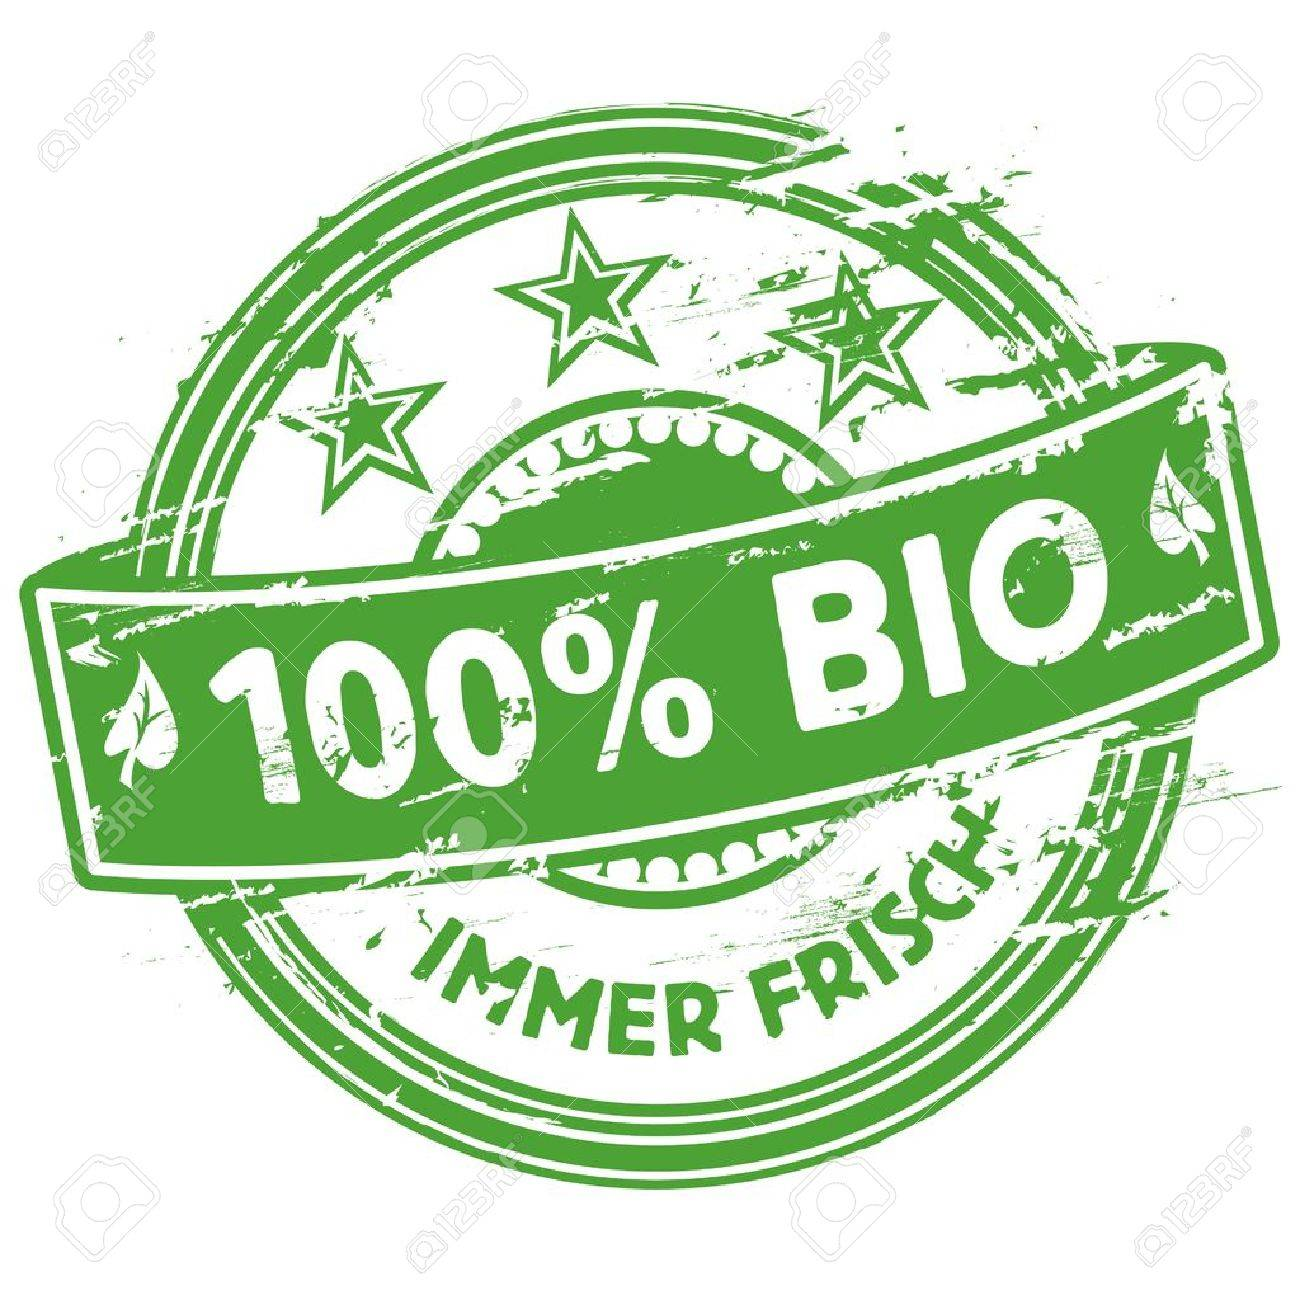 Rubber stamp 100  Bio Stock Vector - 15443135